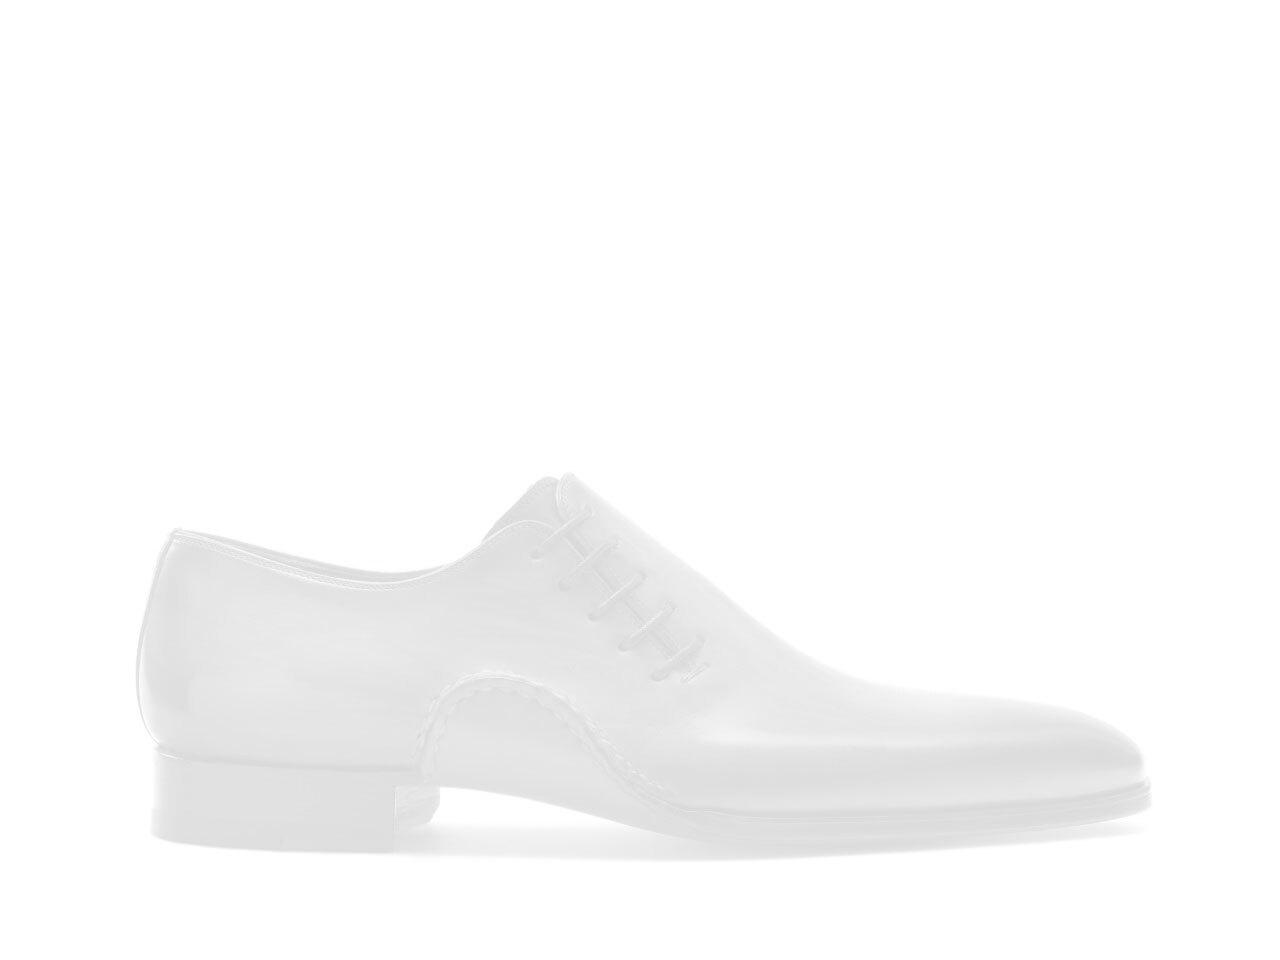 Sole of the Magnanni Raro Black Men's Slip On Loafers